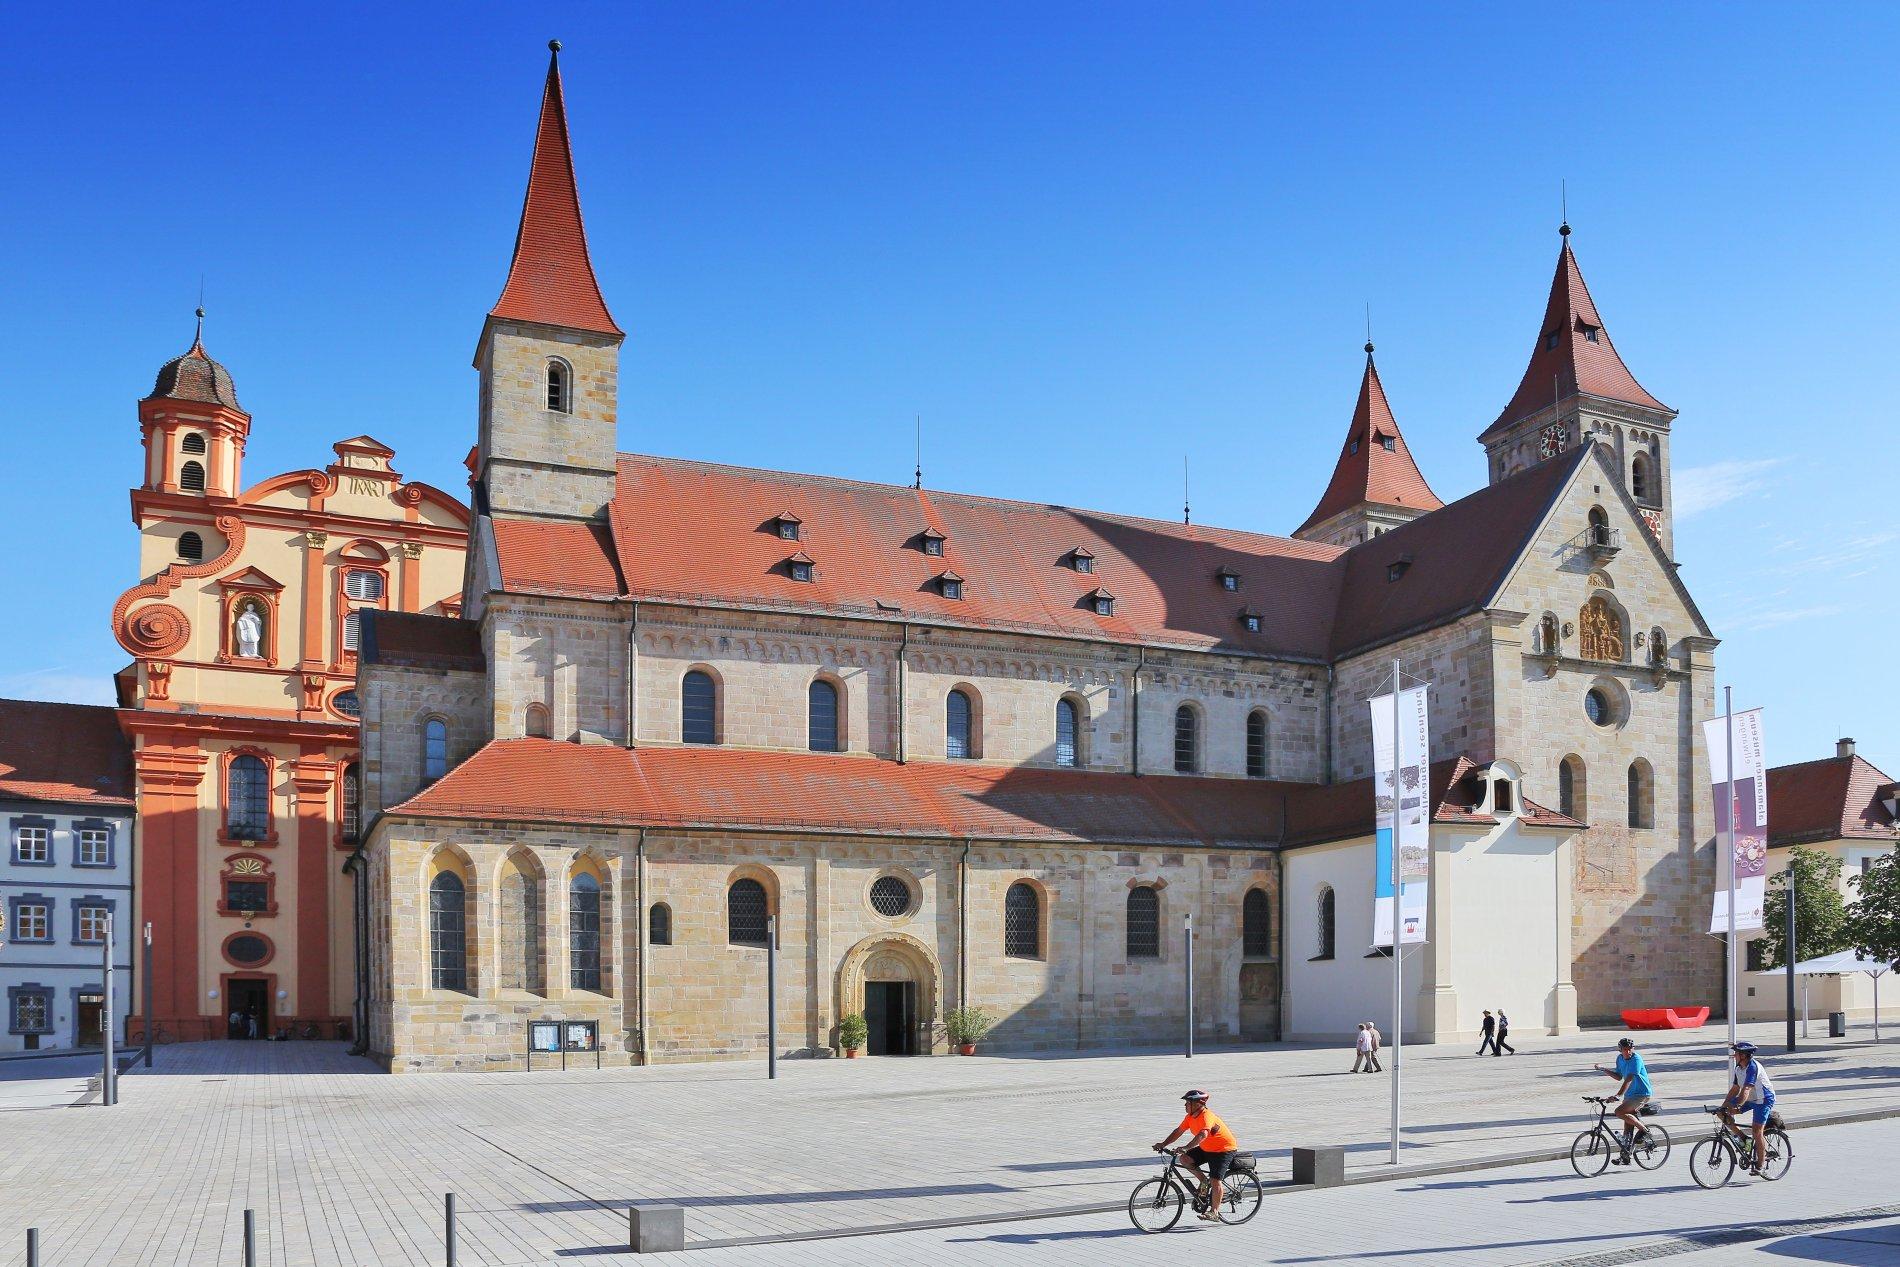 Basilika mit ev. Kirche in Ellwangen